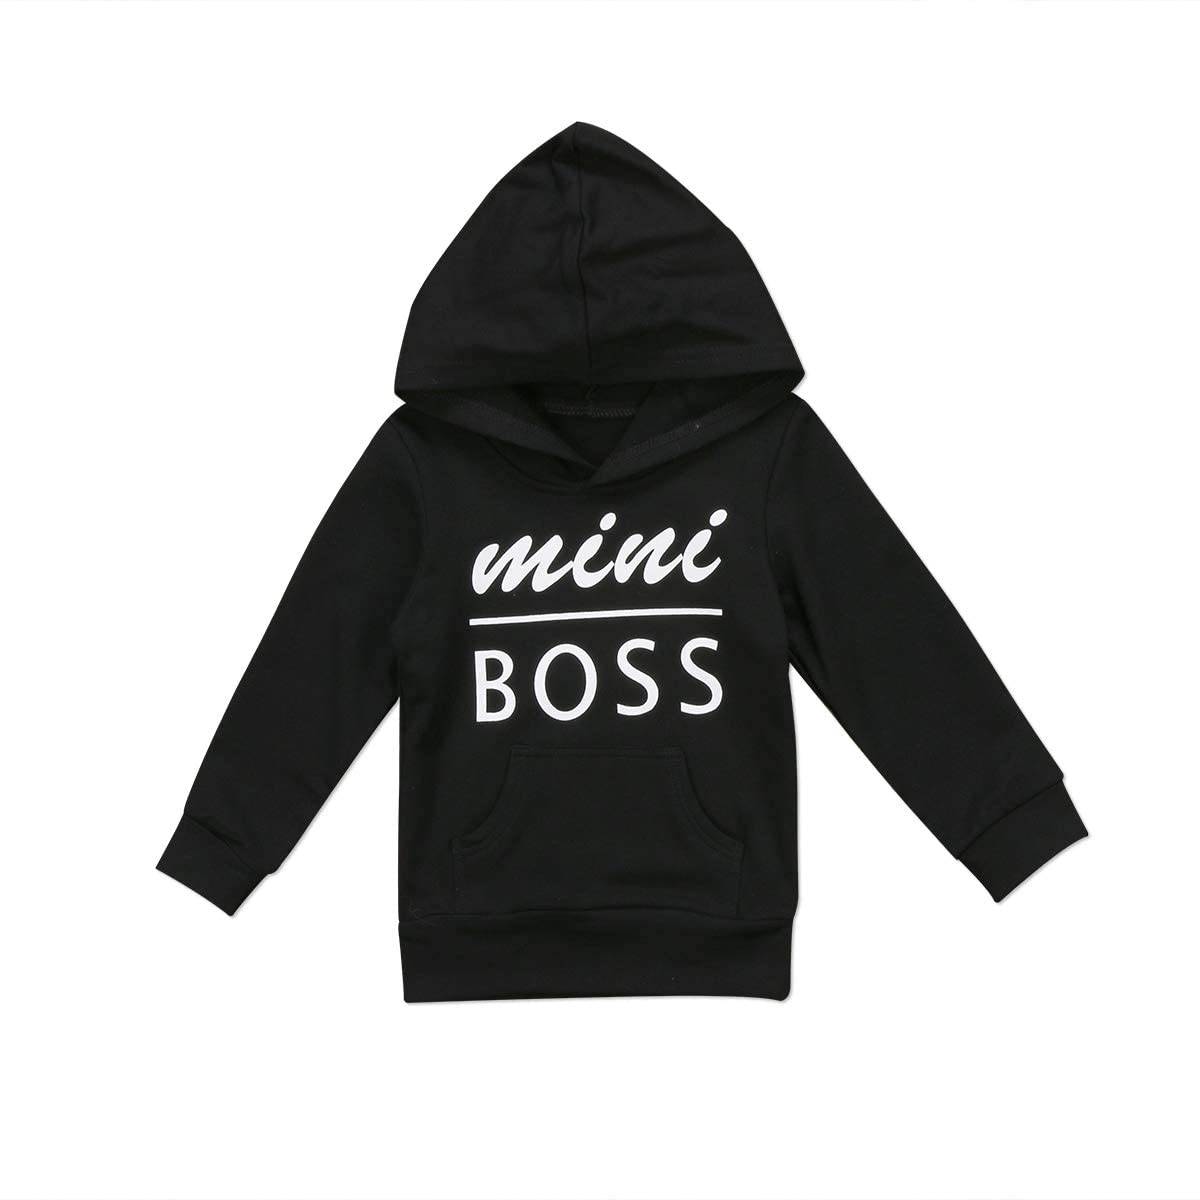 Kid Boy Girls Mini Boss Hoodie Solid Long Sleeve Letter Sweater Tops Hooded Sweatshirt Outwear Pullover Outdoor with Pocket